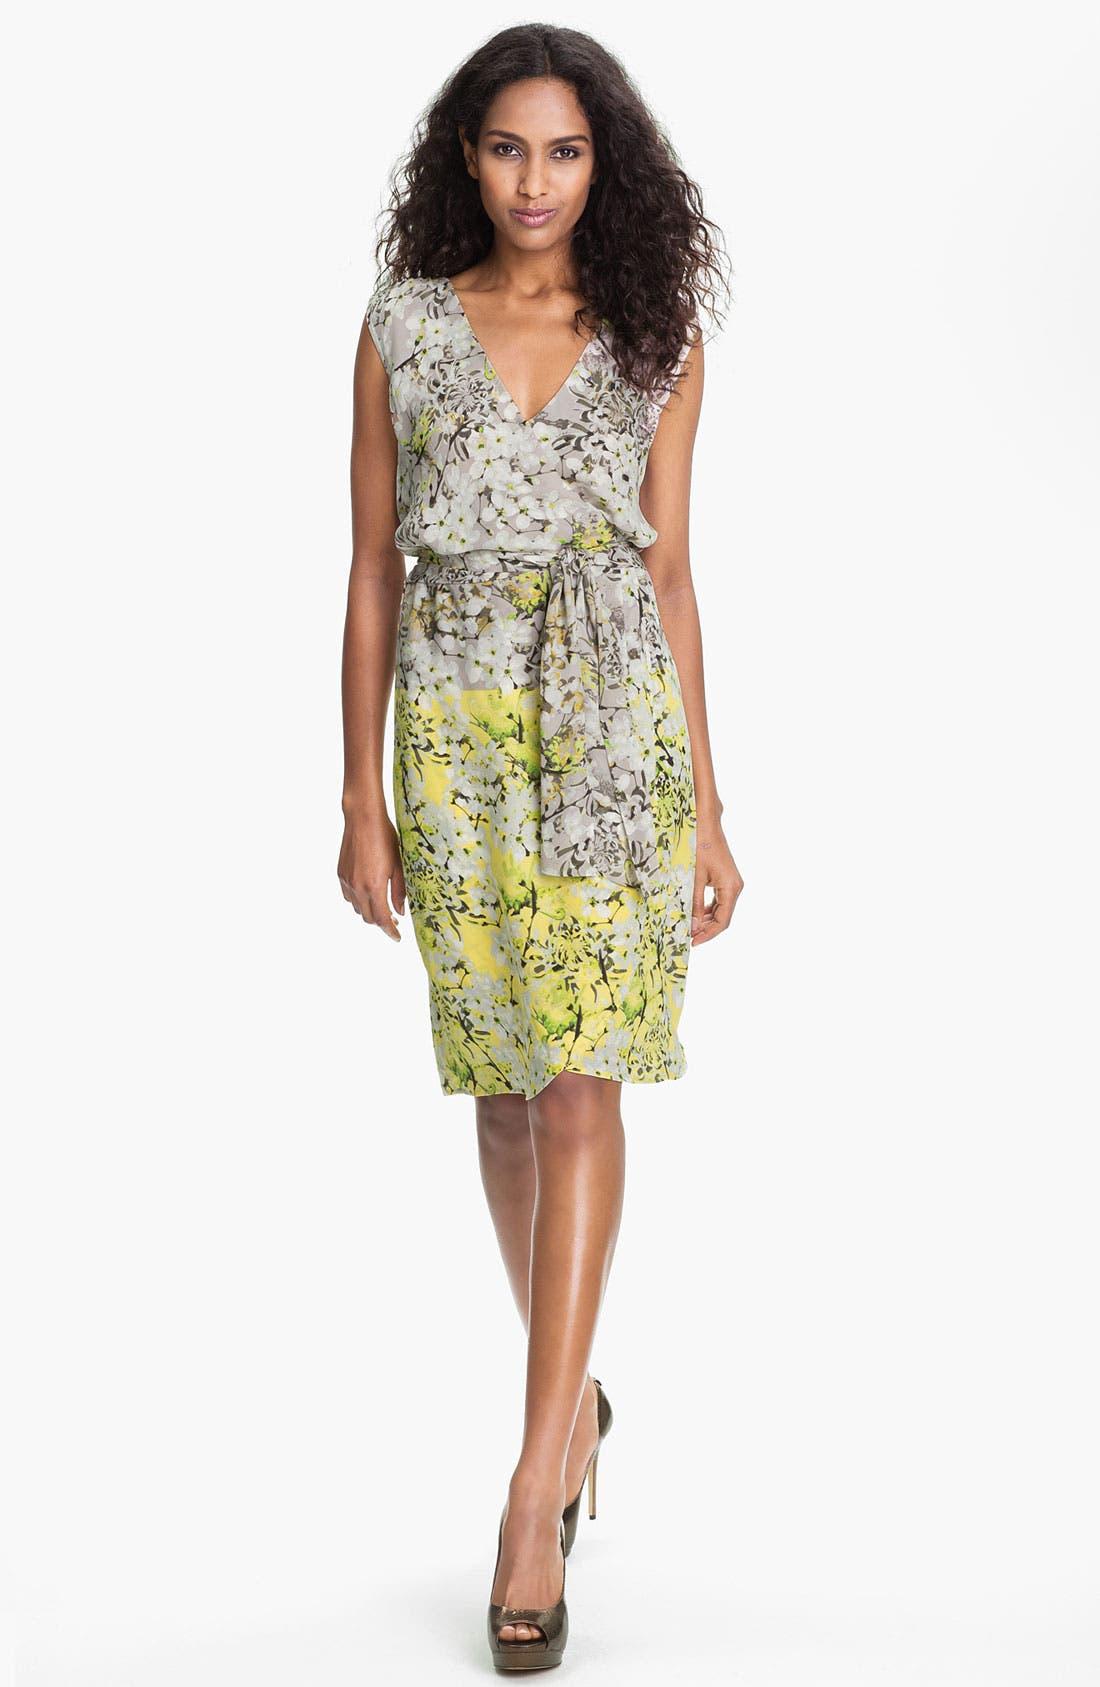 Alternate Image 1 Selected - Nic + Zoe 'Petals a Plenty' Dress